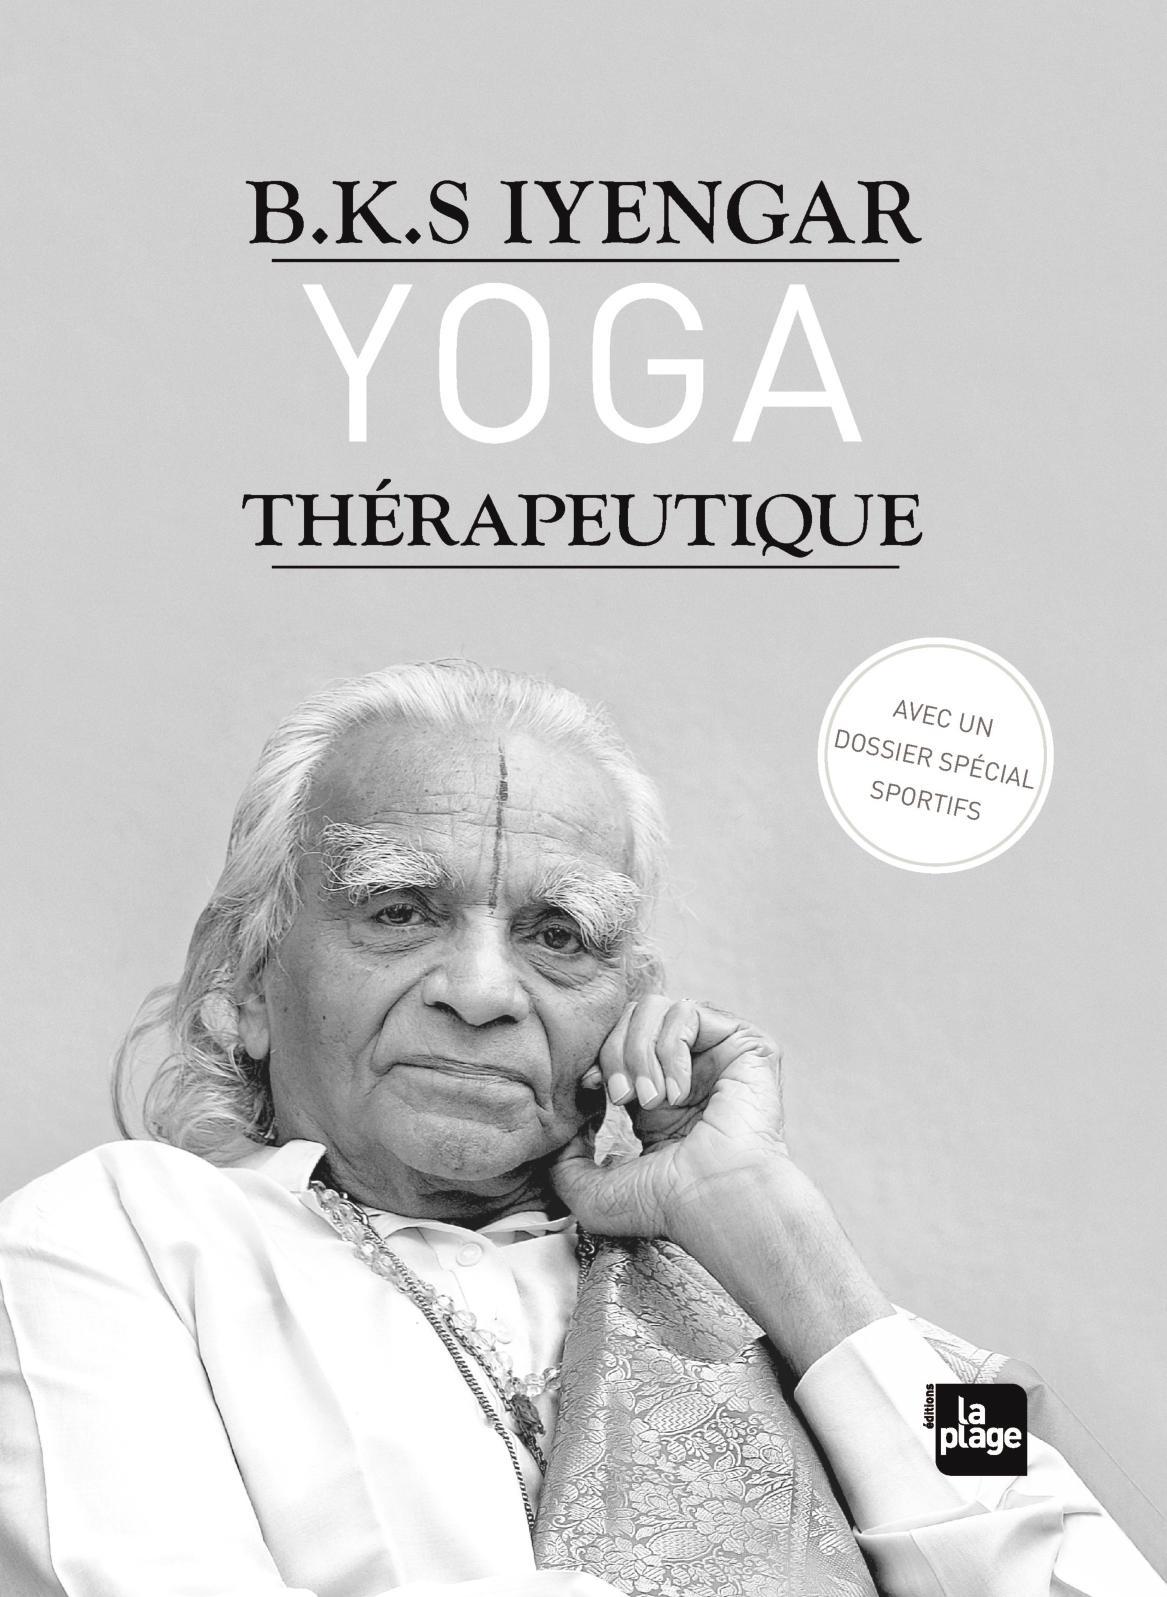 Calaméo - Yoga Thérapeutique - B.K.S. Iyengar ccf97e2772a